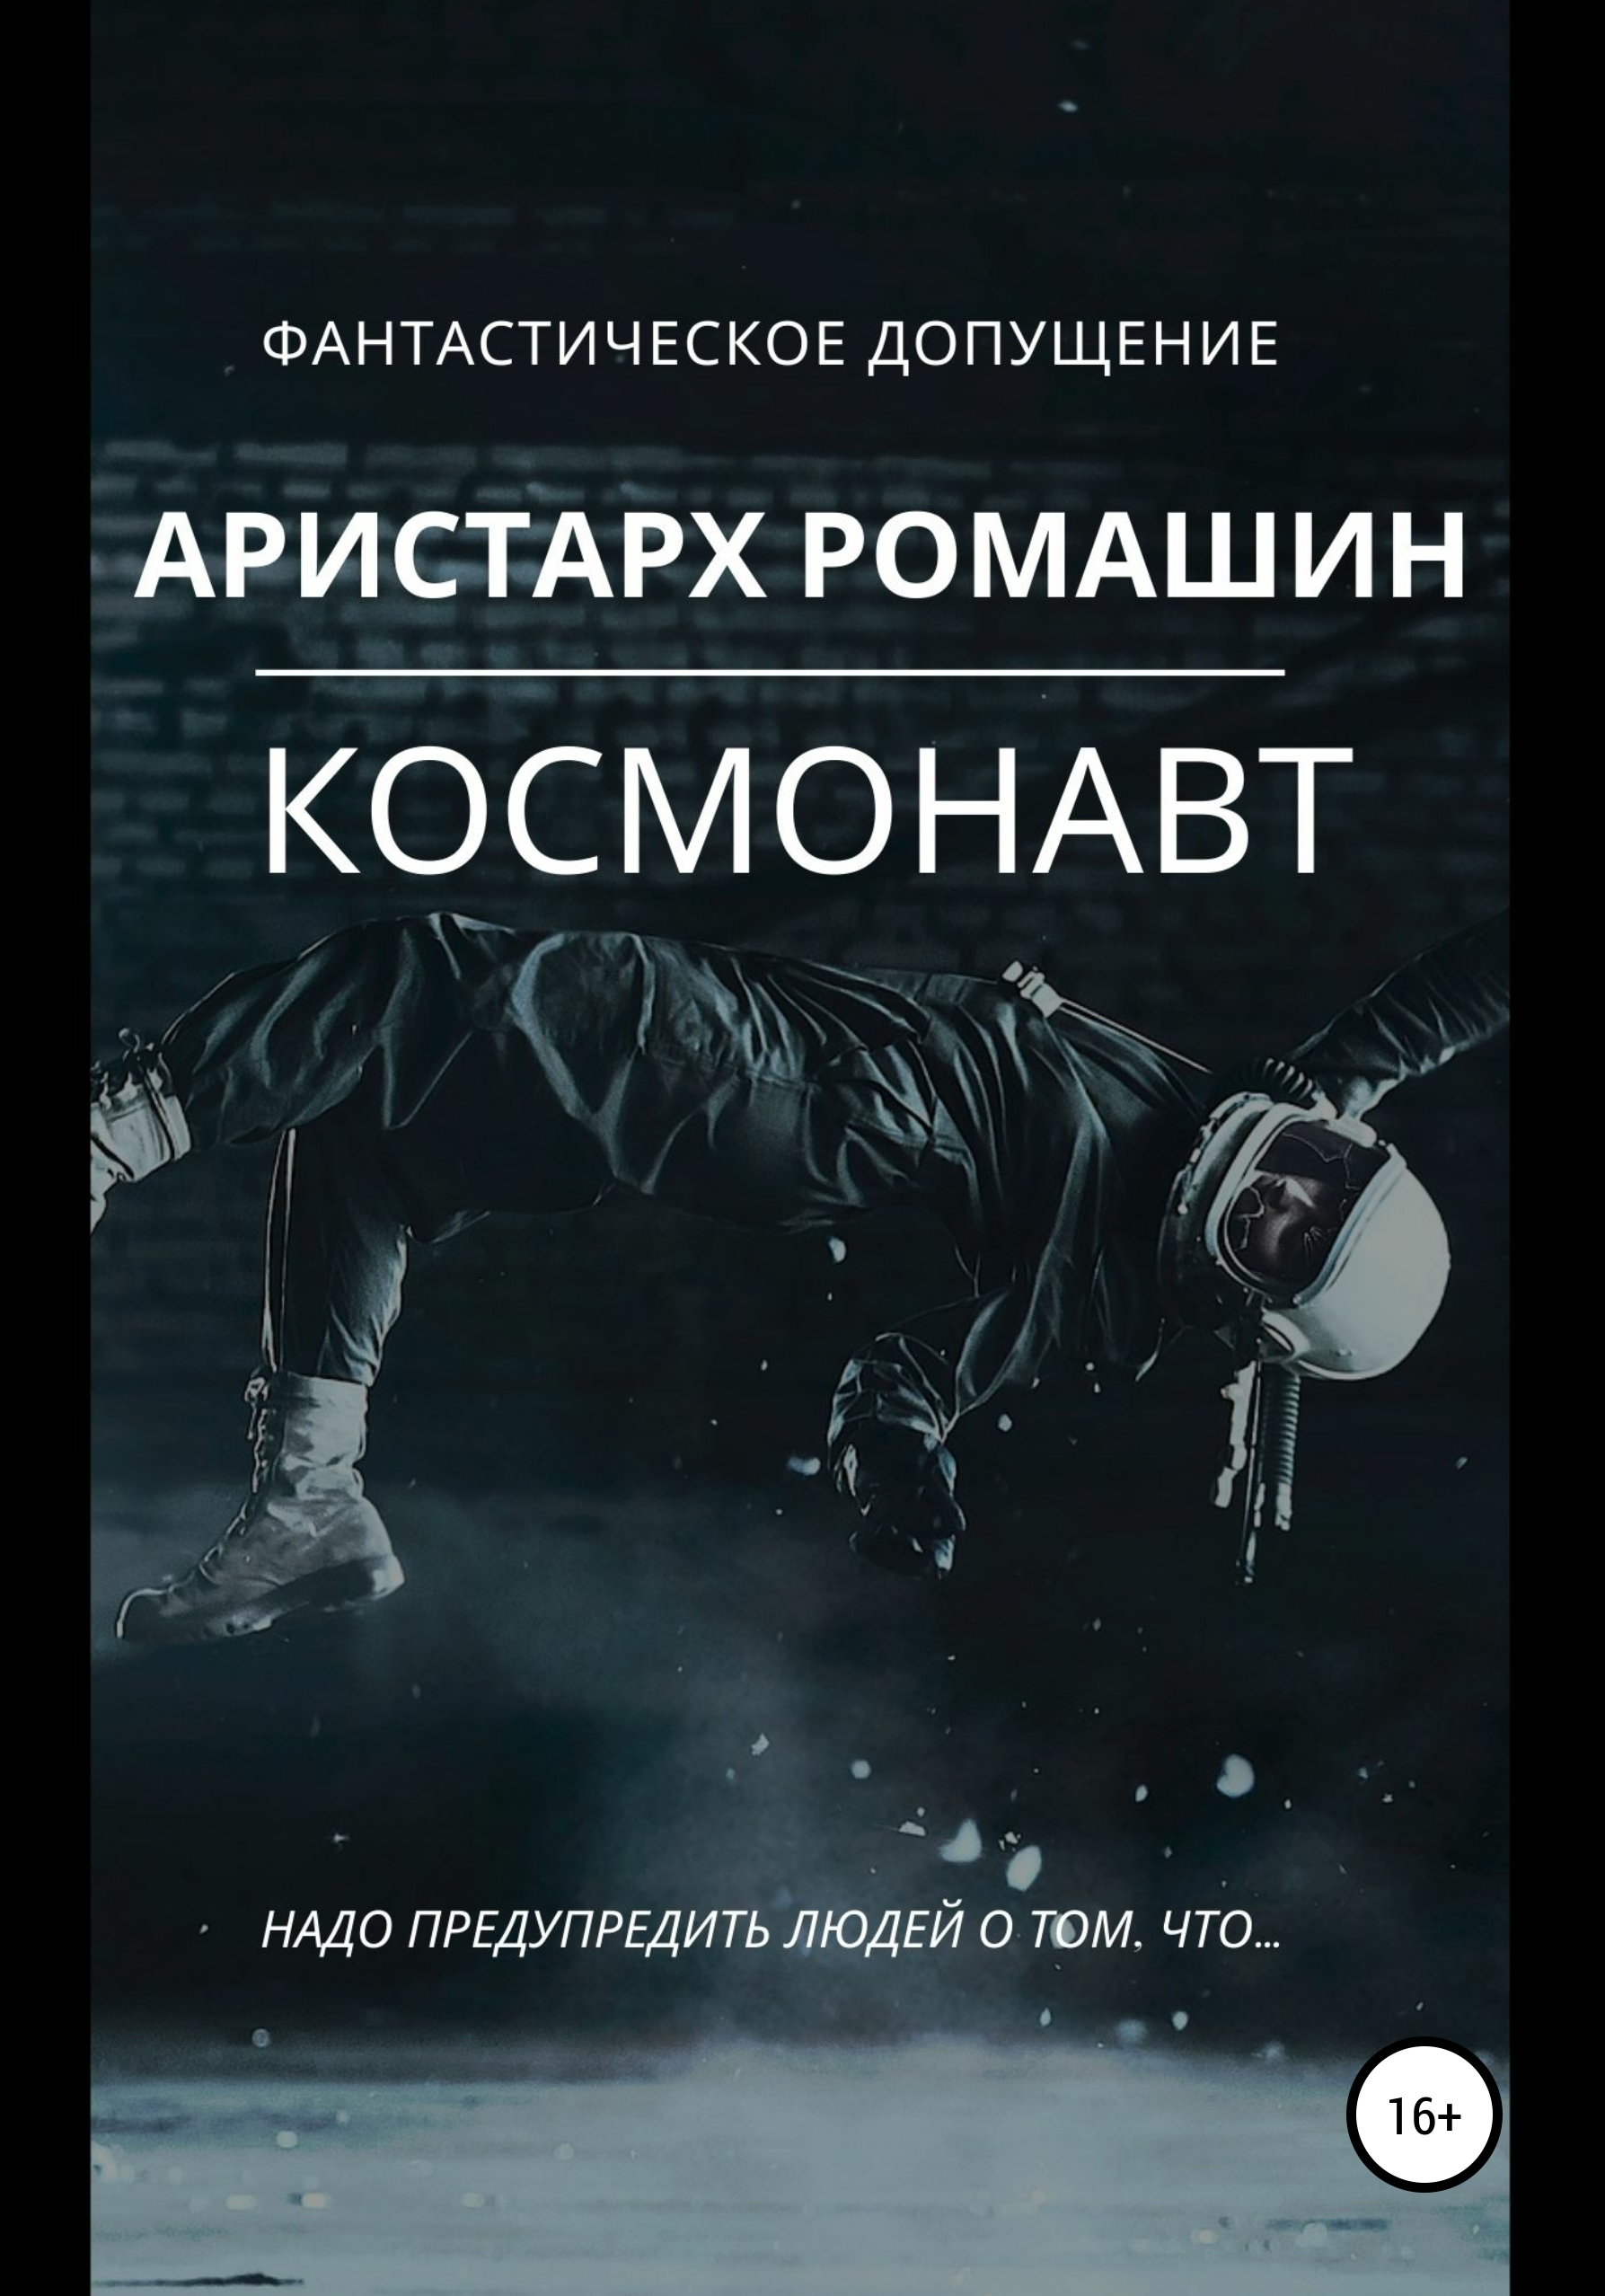 Аристарх Ромашин Космонавт аристарх ромашин призраки